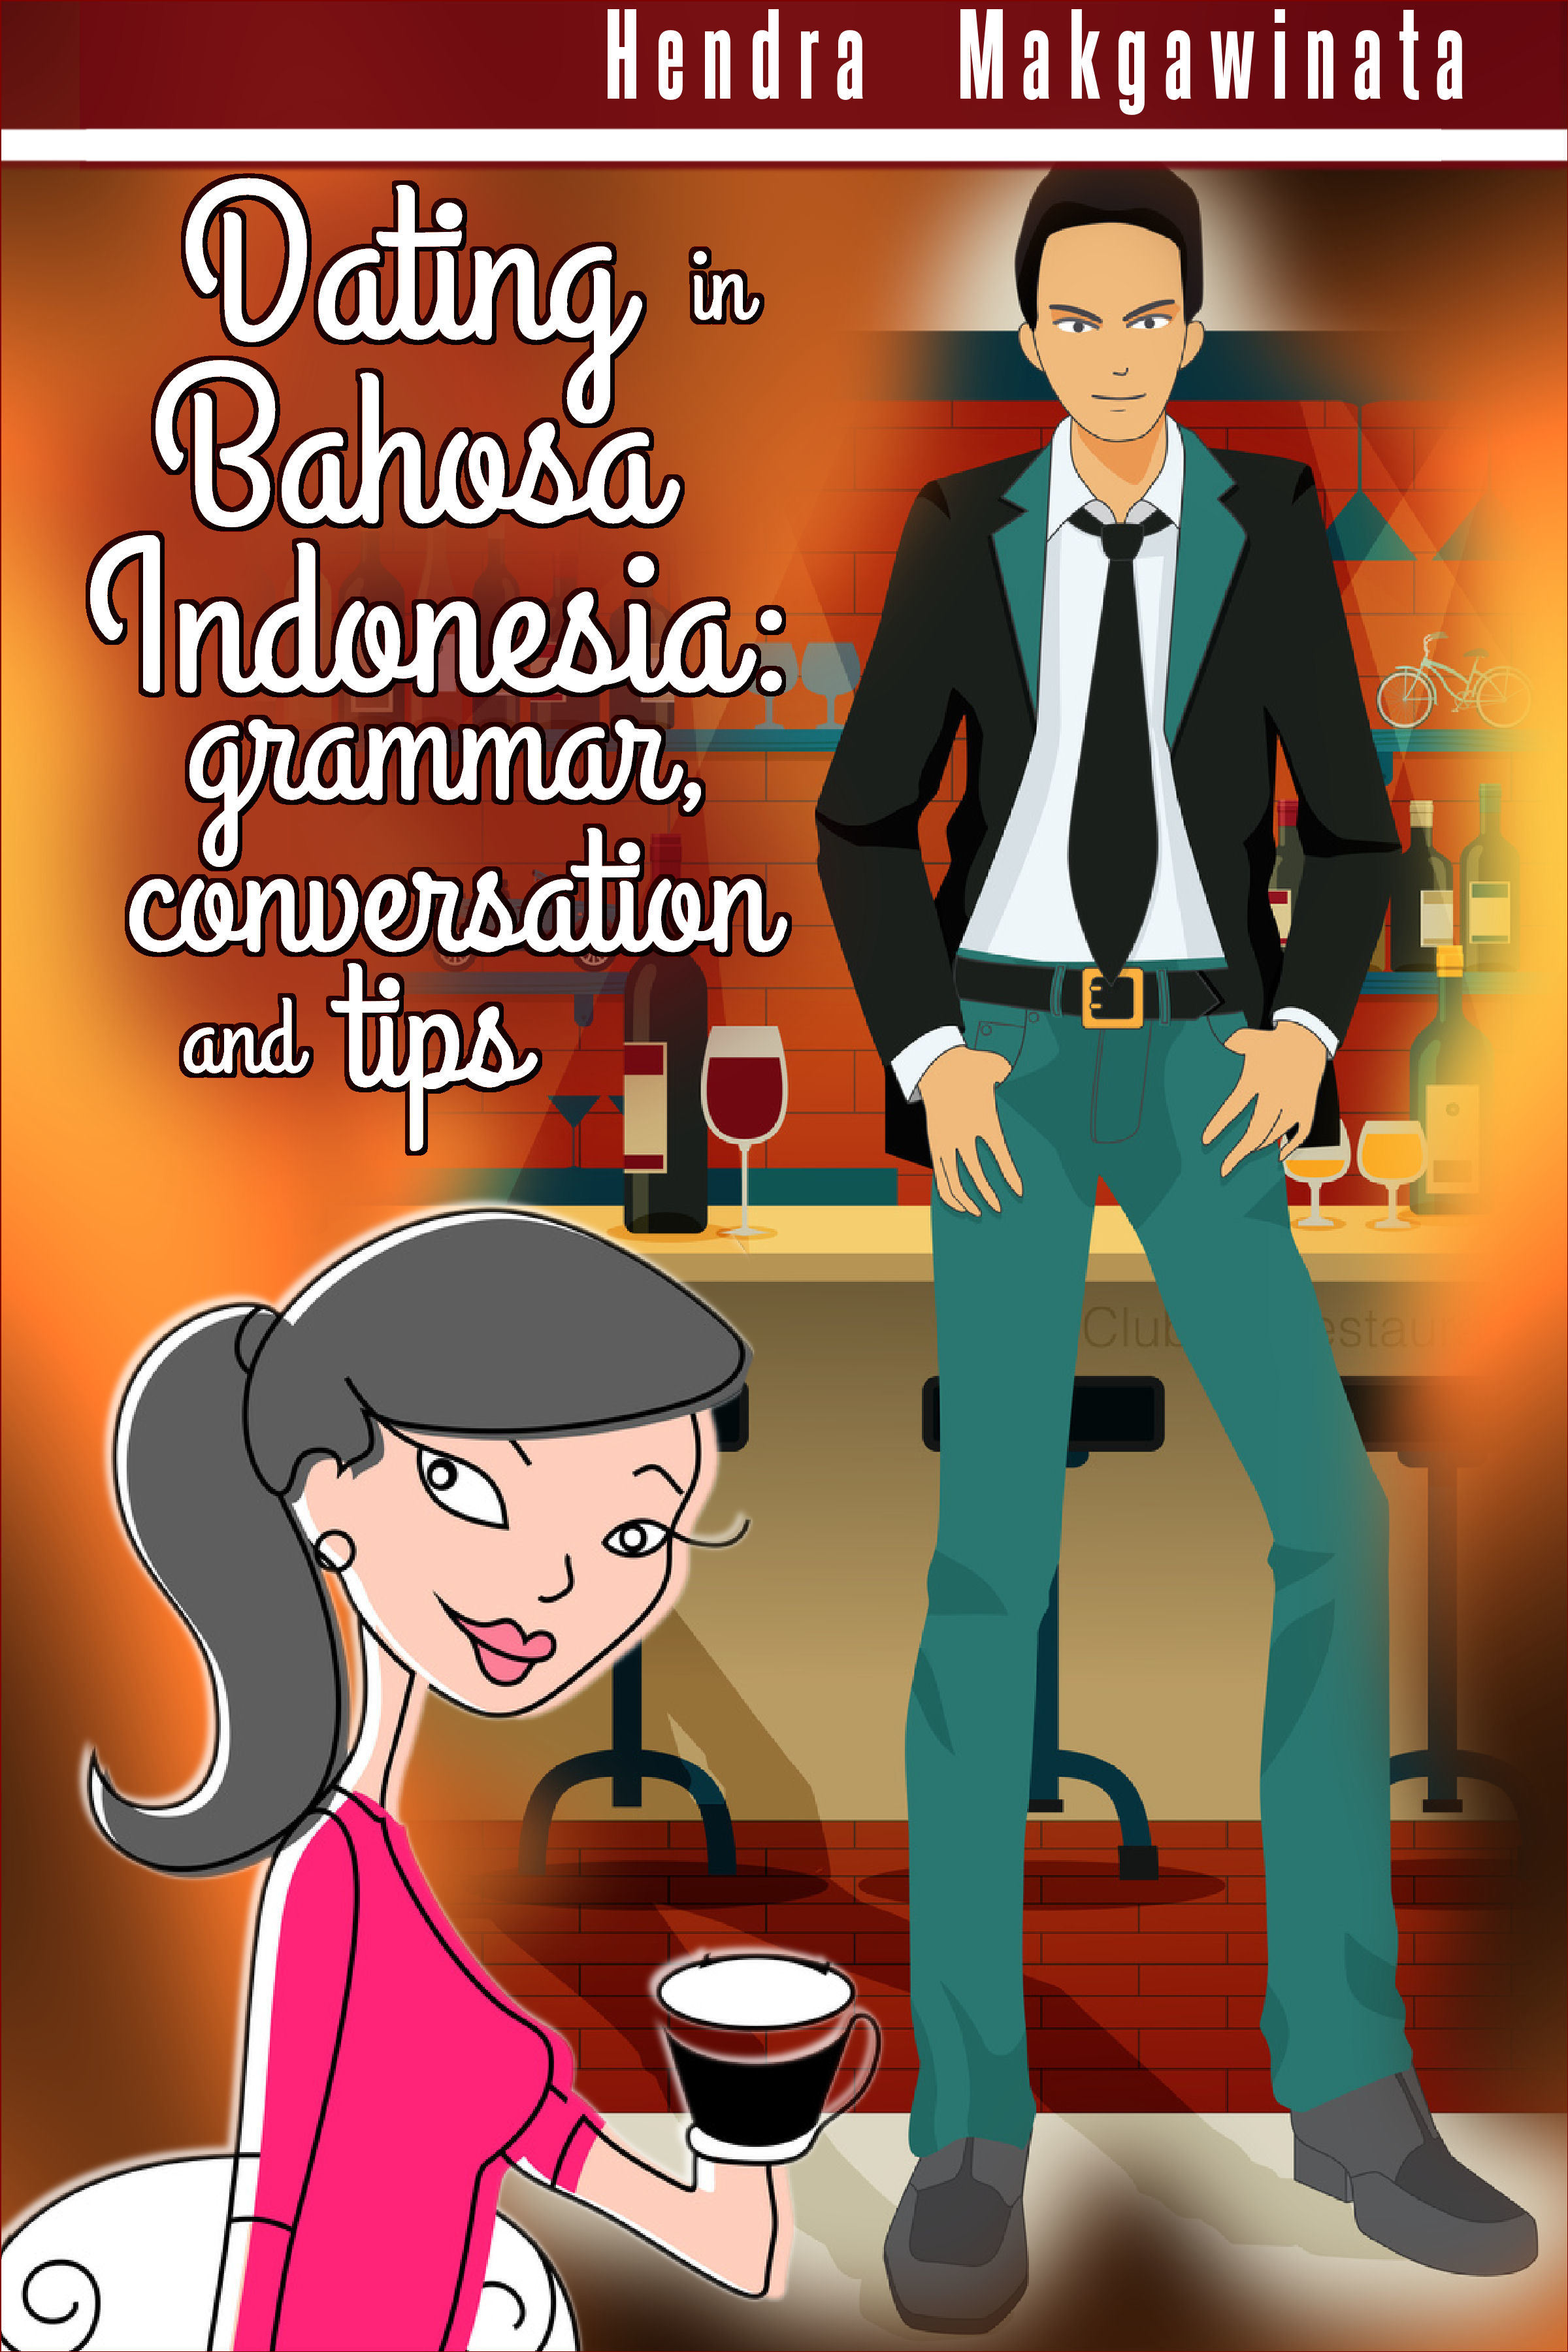 Dating in Bahasa Indonesia: grammar, conversation and tips Hendra Makgawinata